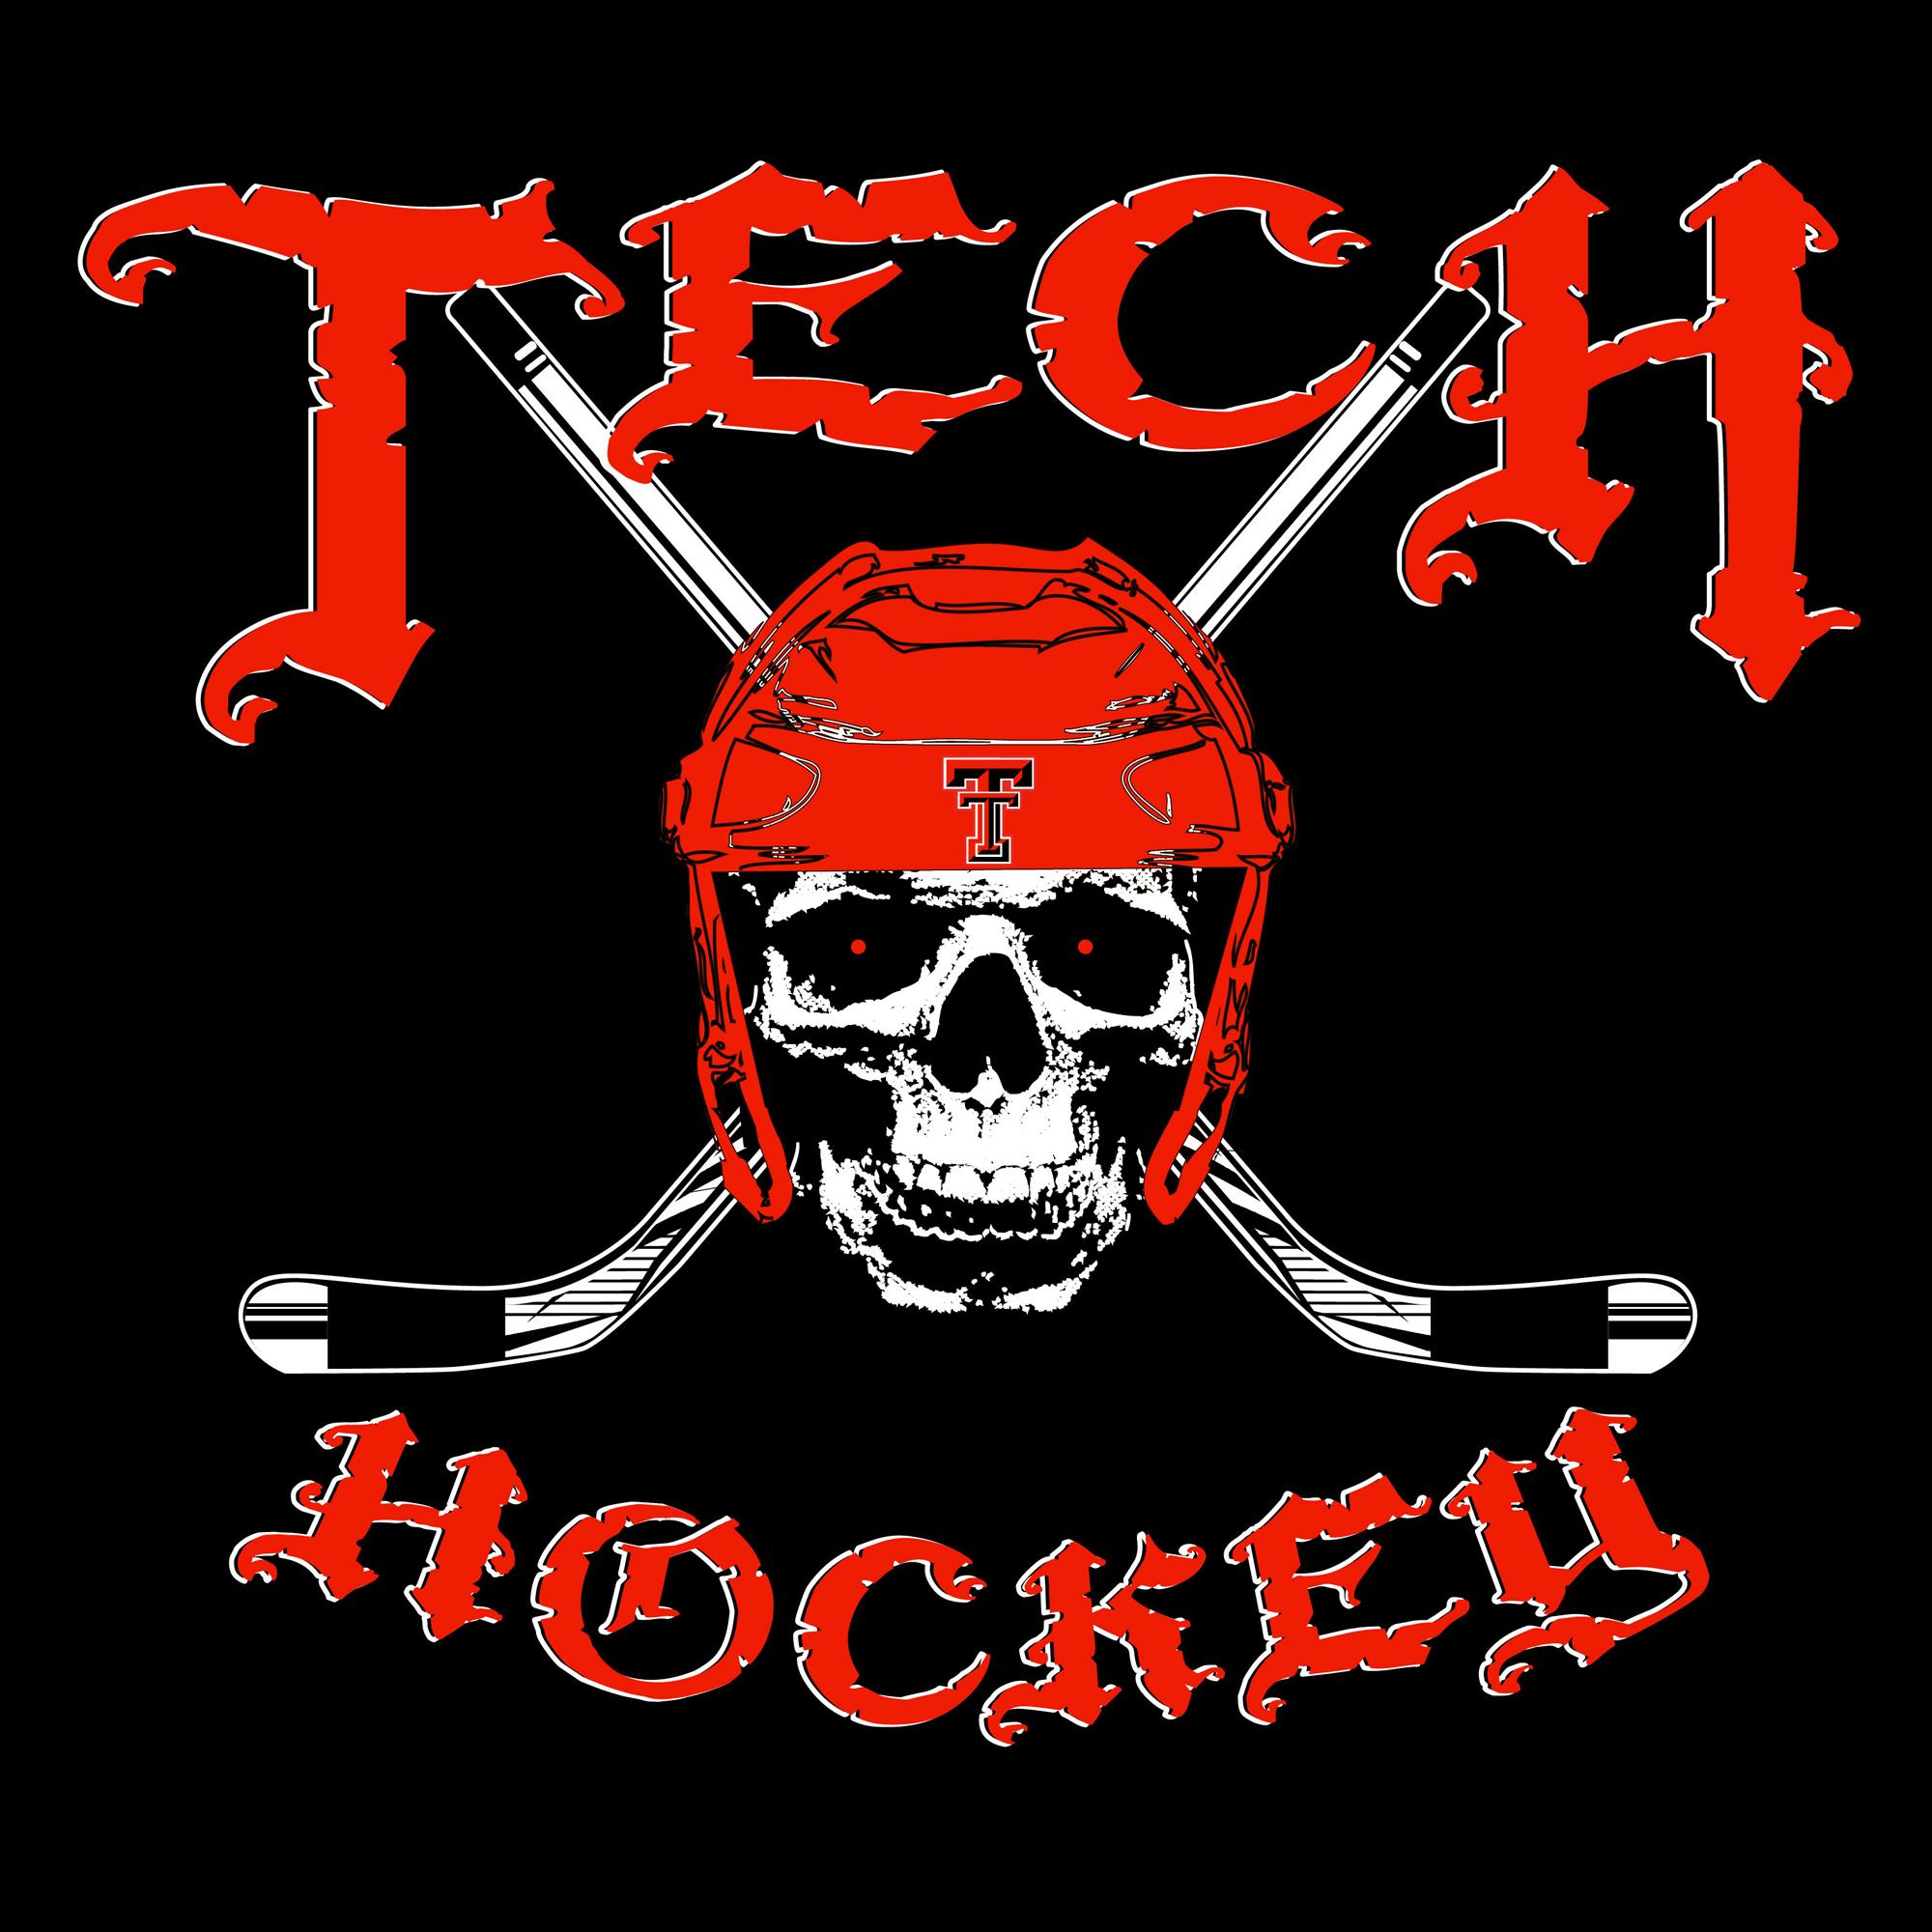 TexasTechHocke.jpg